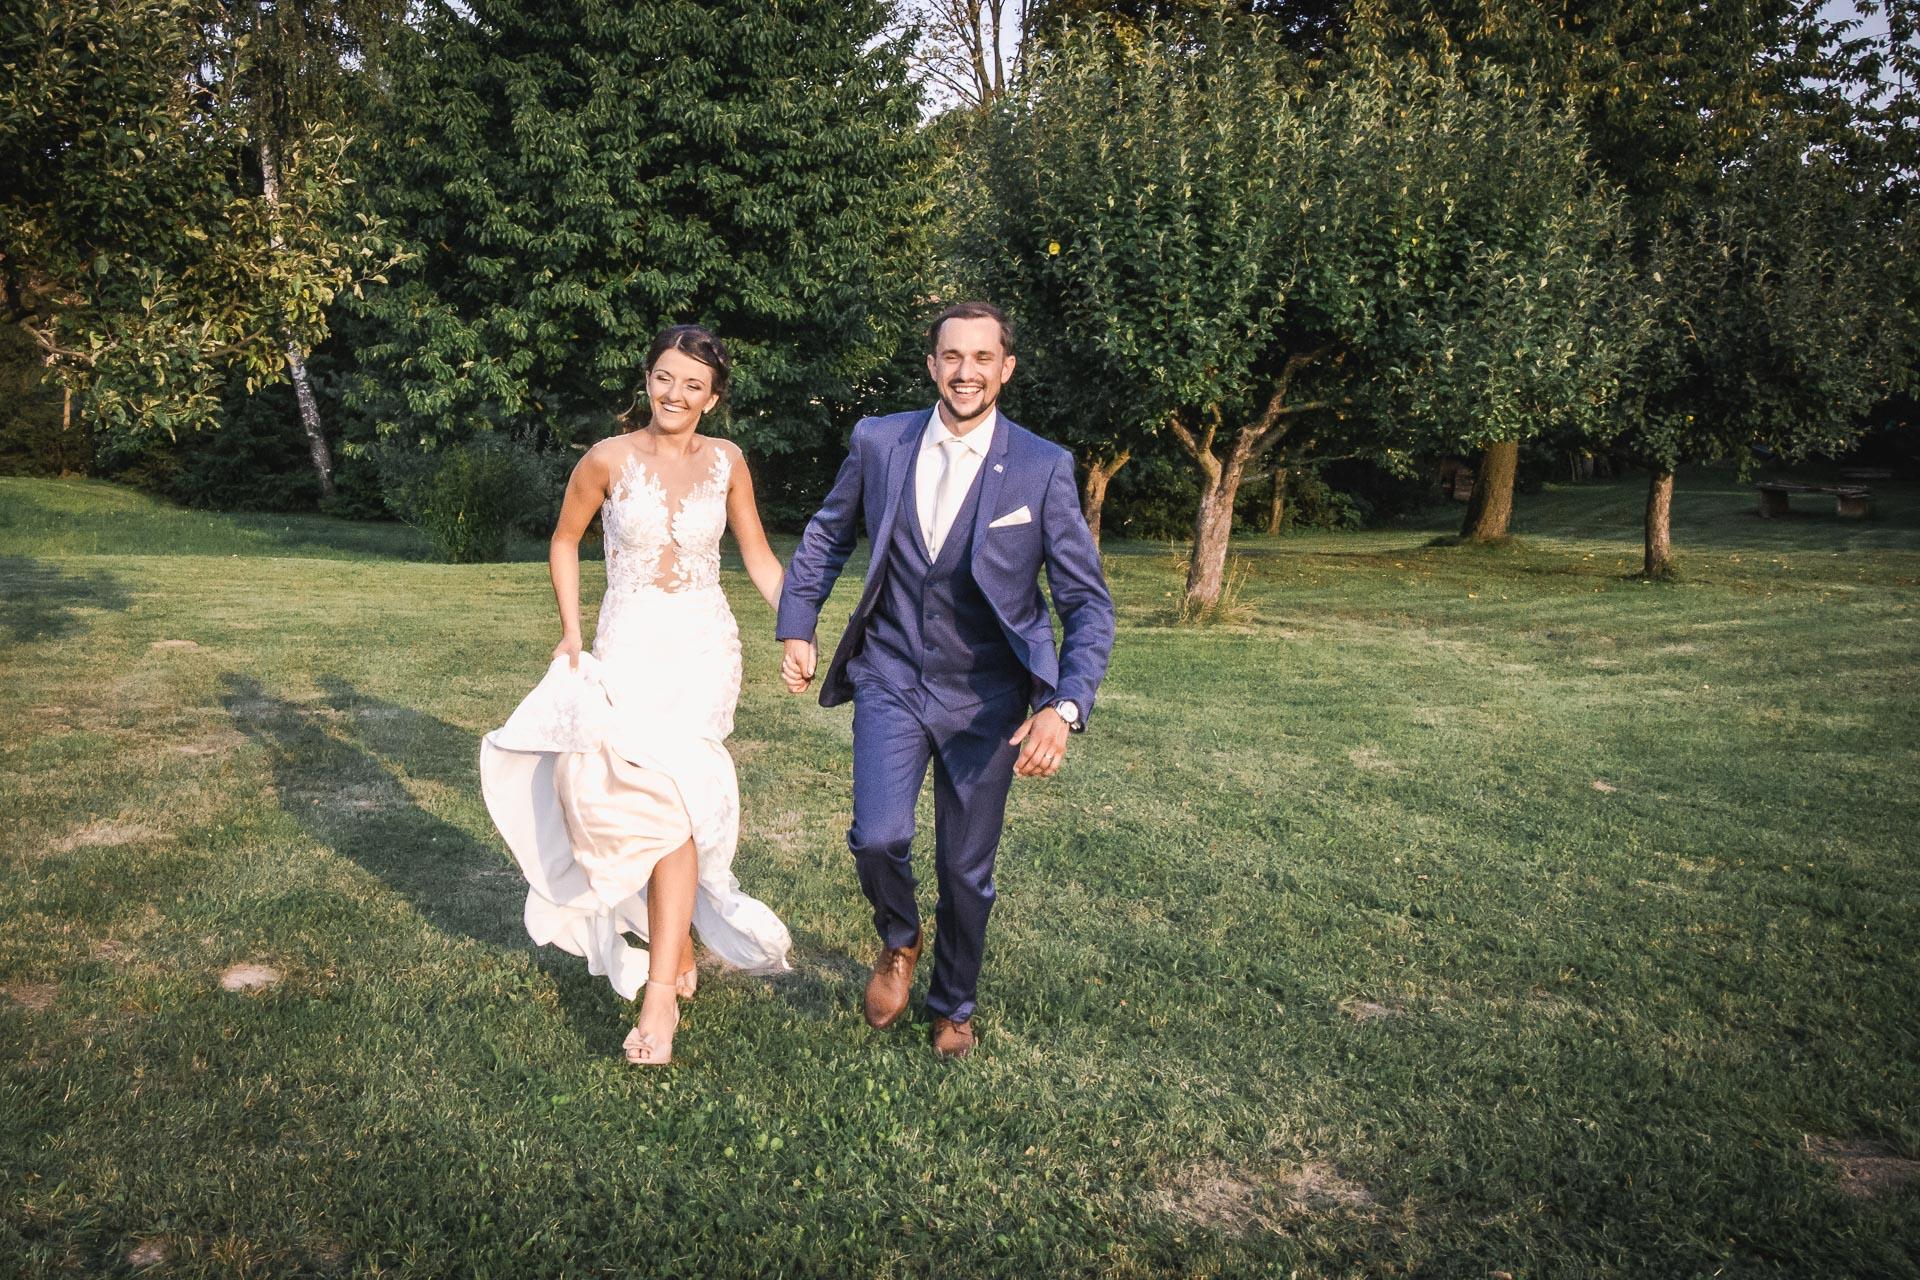 svatební-fotograf-wedding-svatebni-video-orlík-vltava-kostel-statek-stodola-boho-svatba-Beautyfoto-533